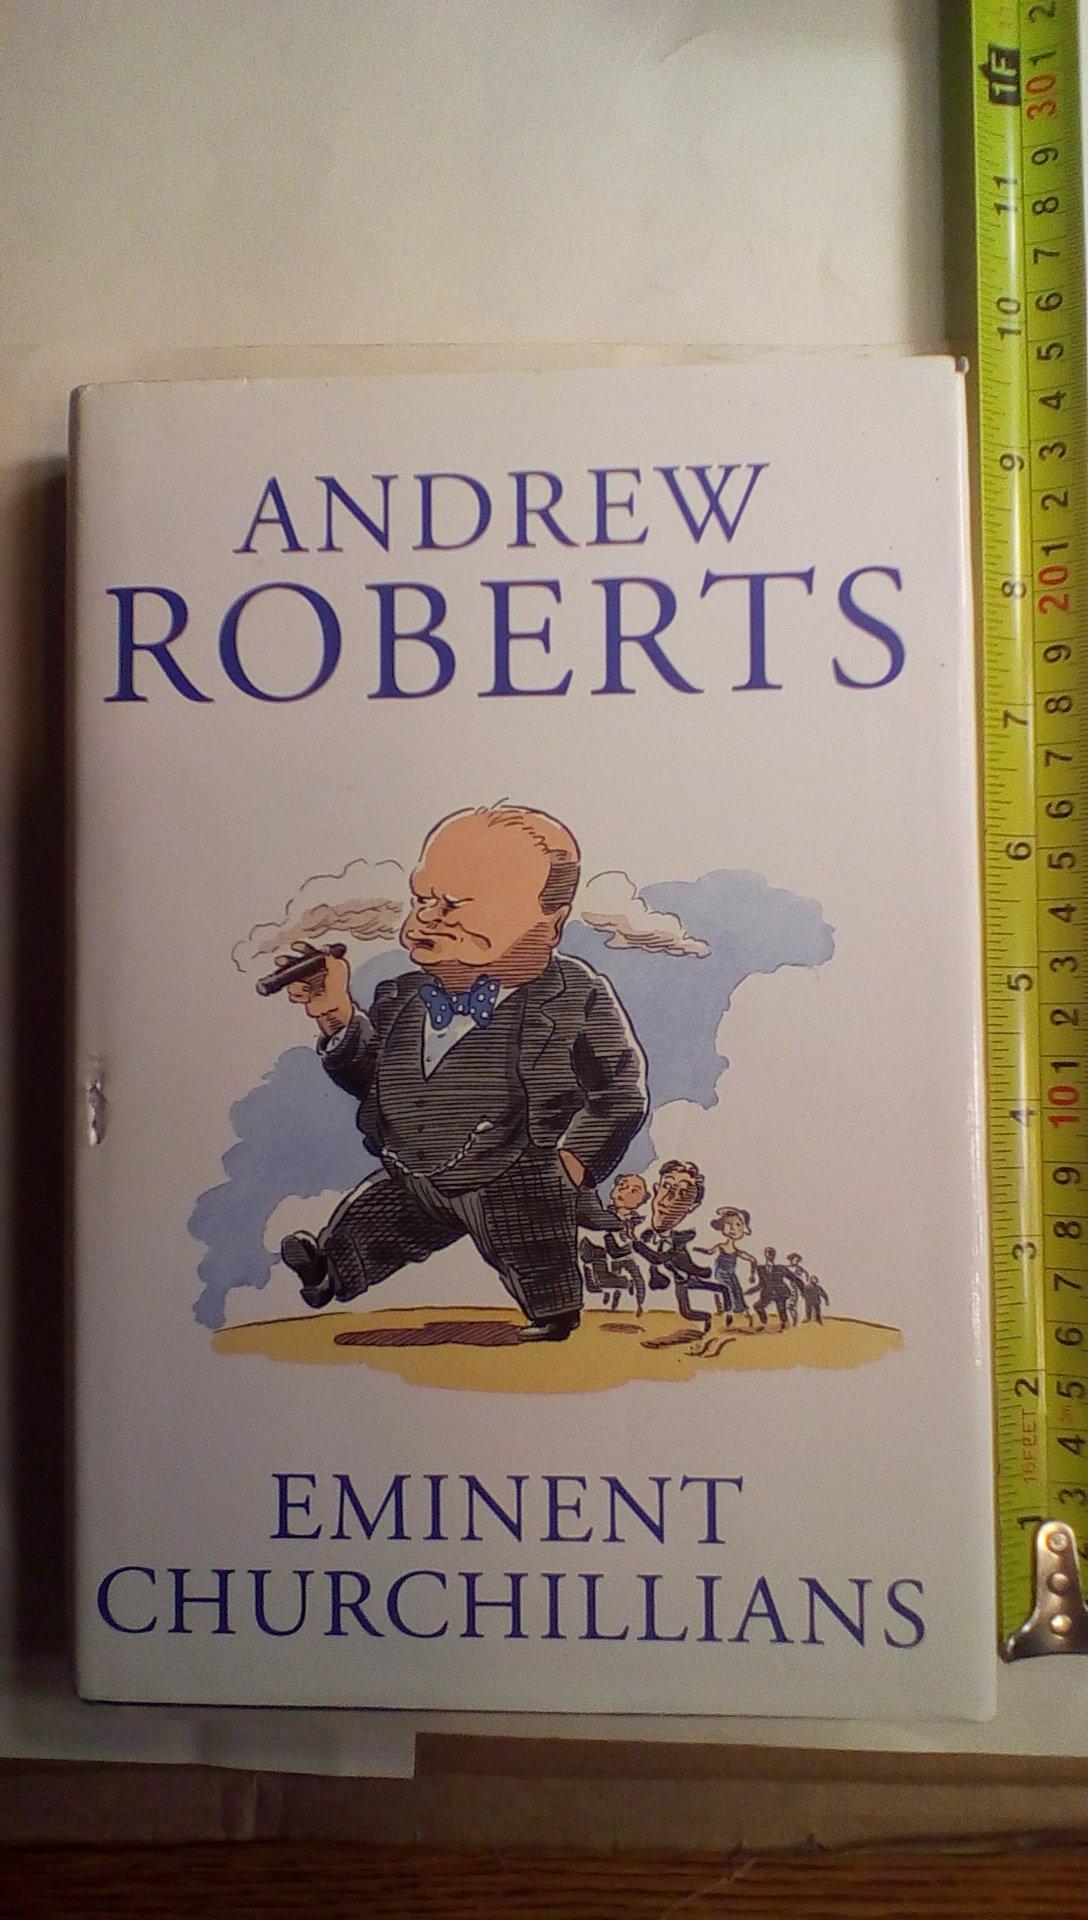 Eminent Churchillians: Andrew Roberts: 9780671769406: Amazon: Books